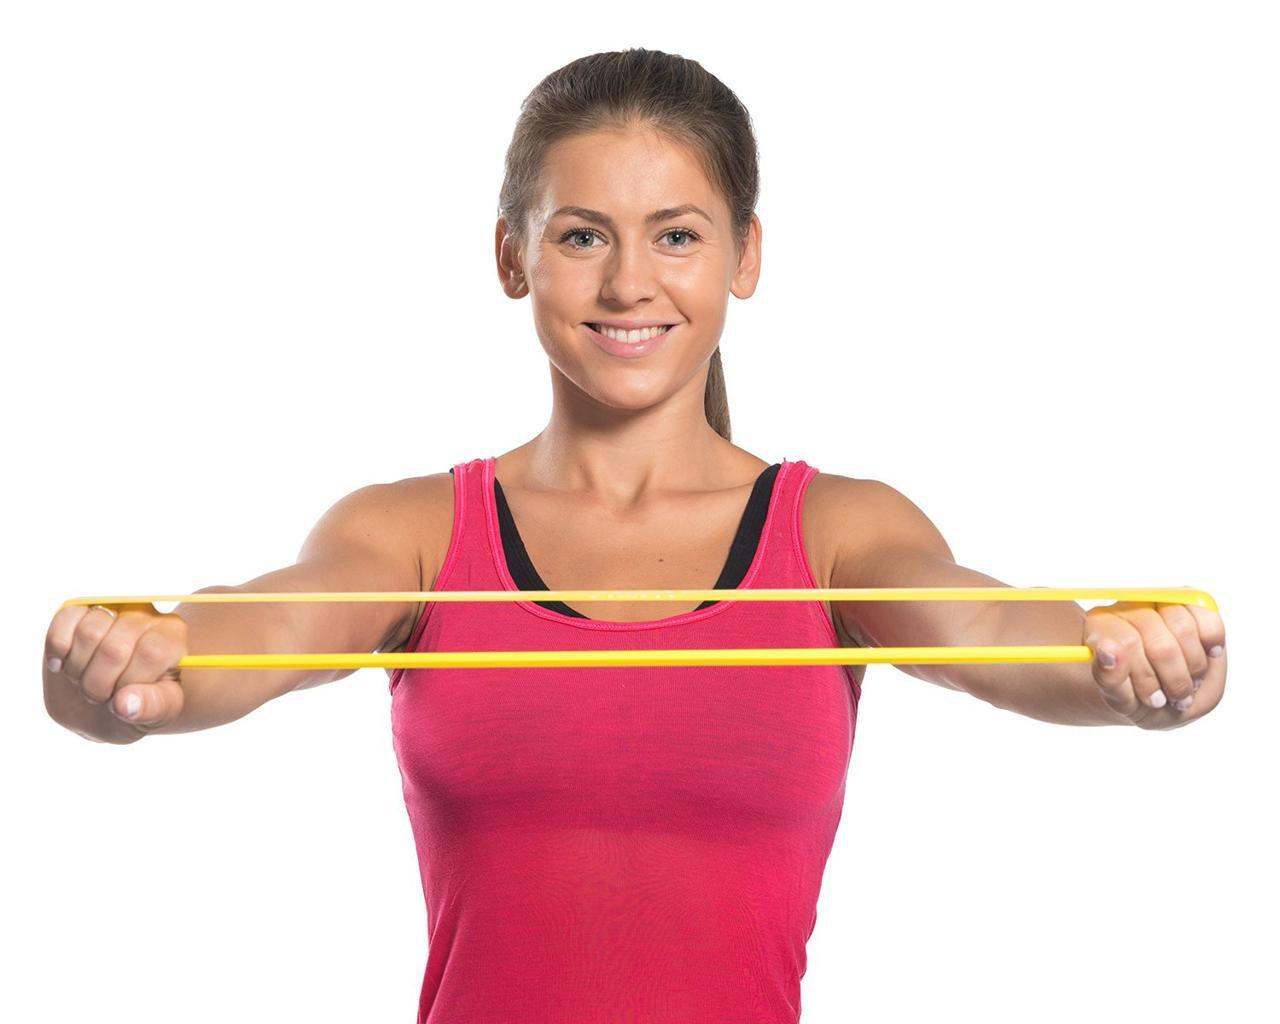 Резинка для фитнеса и спорта (лента эспандер) эластичная (FI-6410-V)